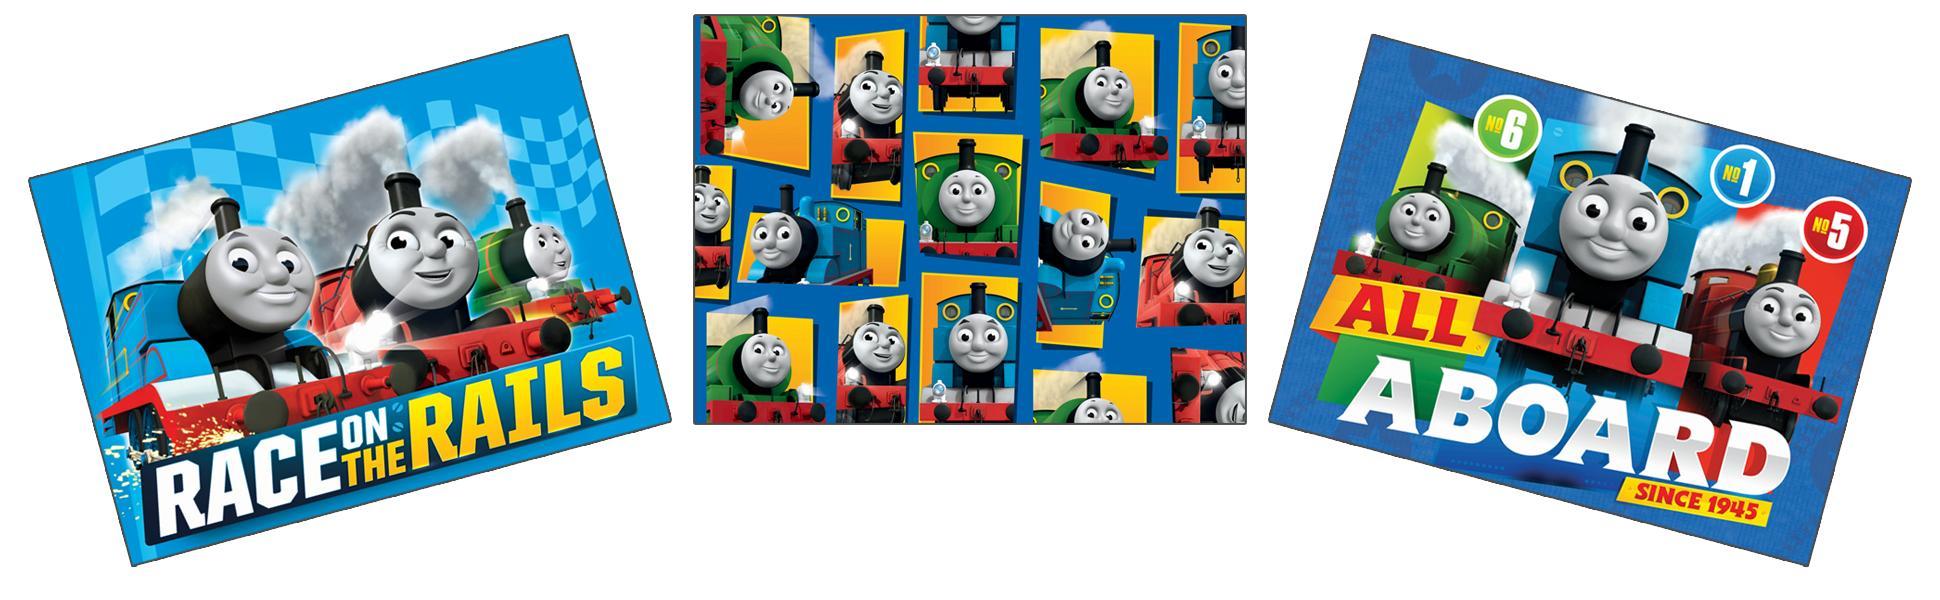 Amazon Com Thomas The Train Toys Rug Percy Thomas And